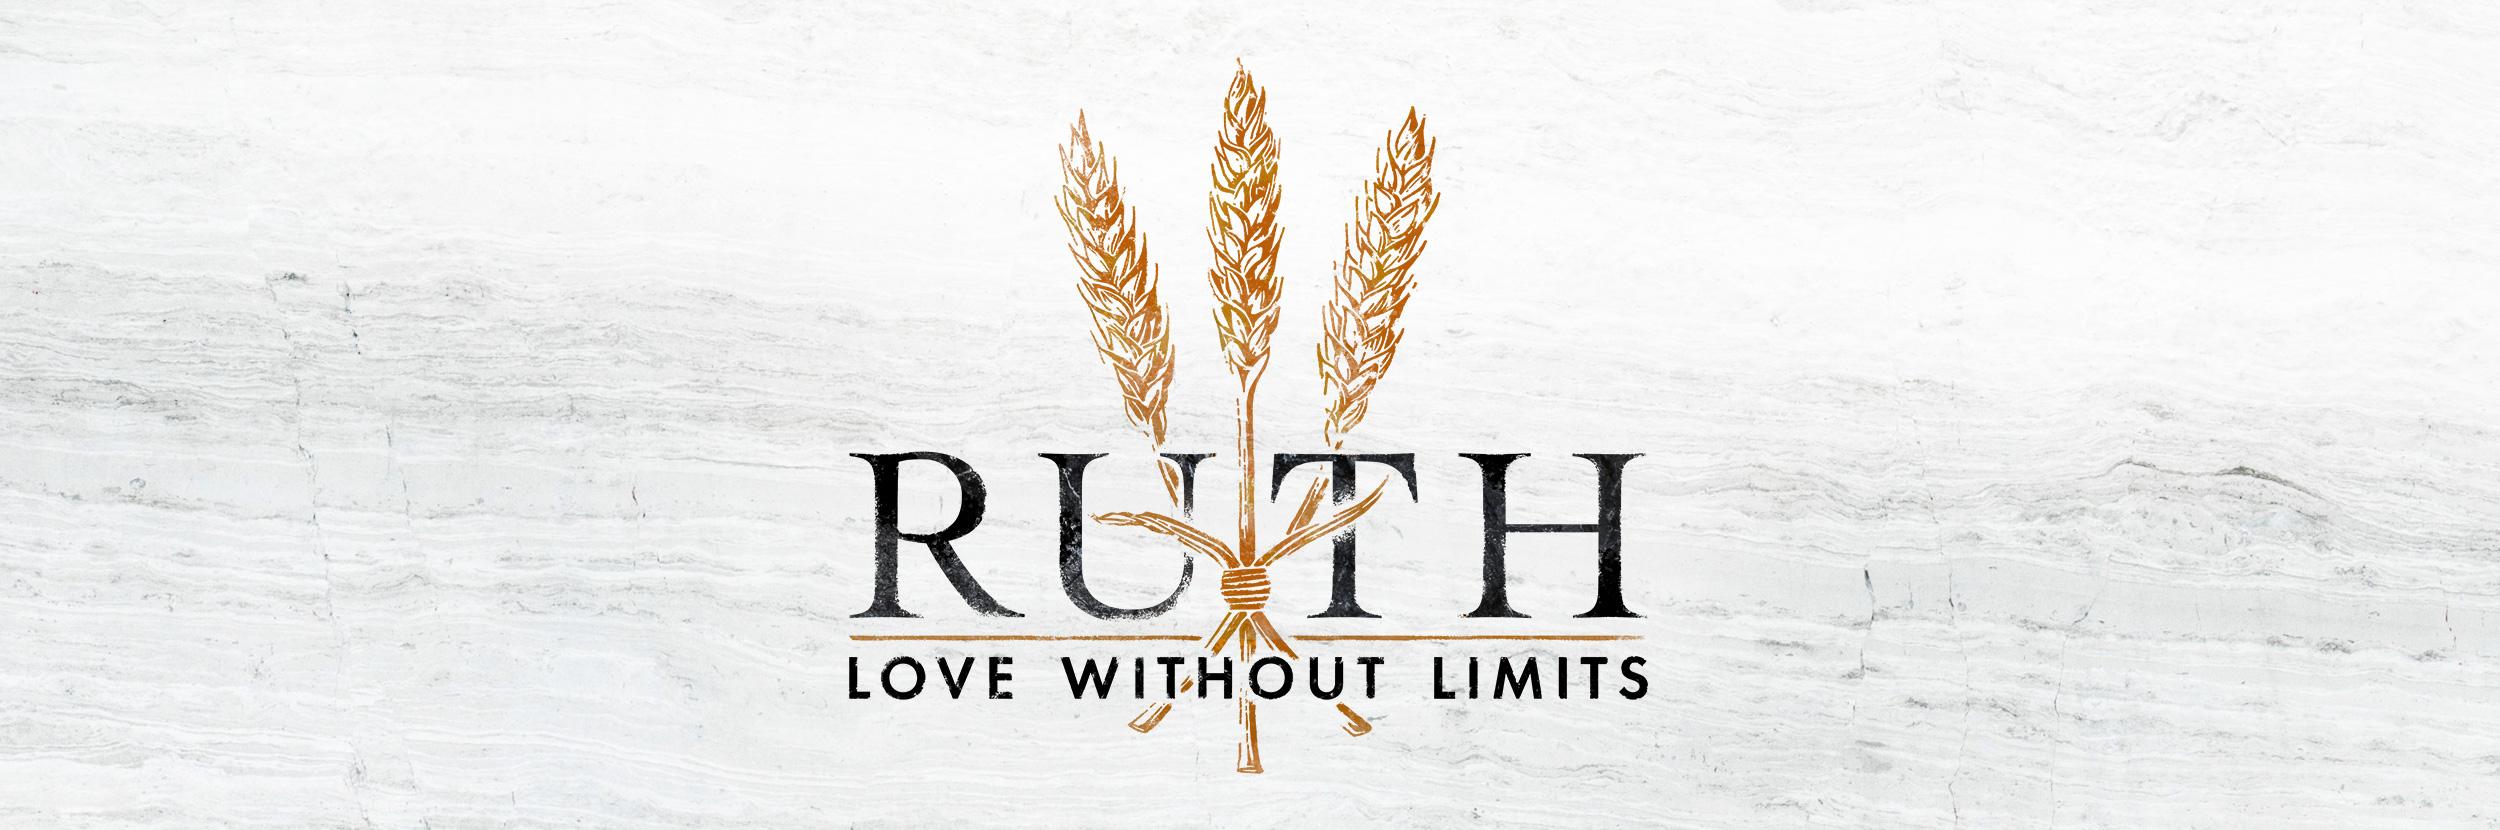 ruth-act4-banner-2500x830.jpg